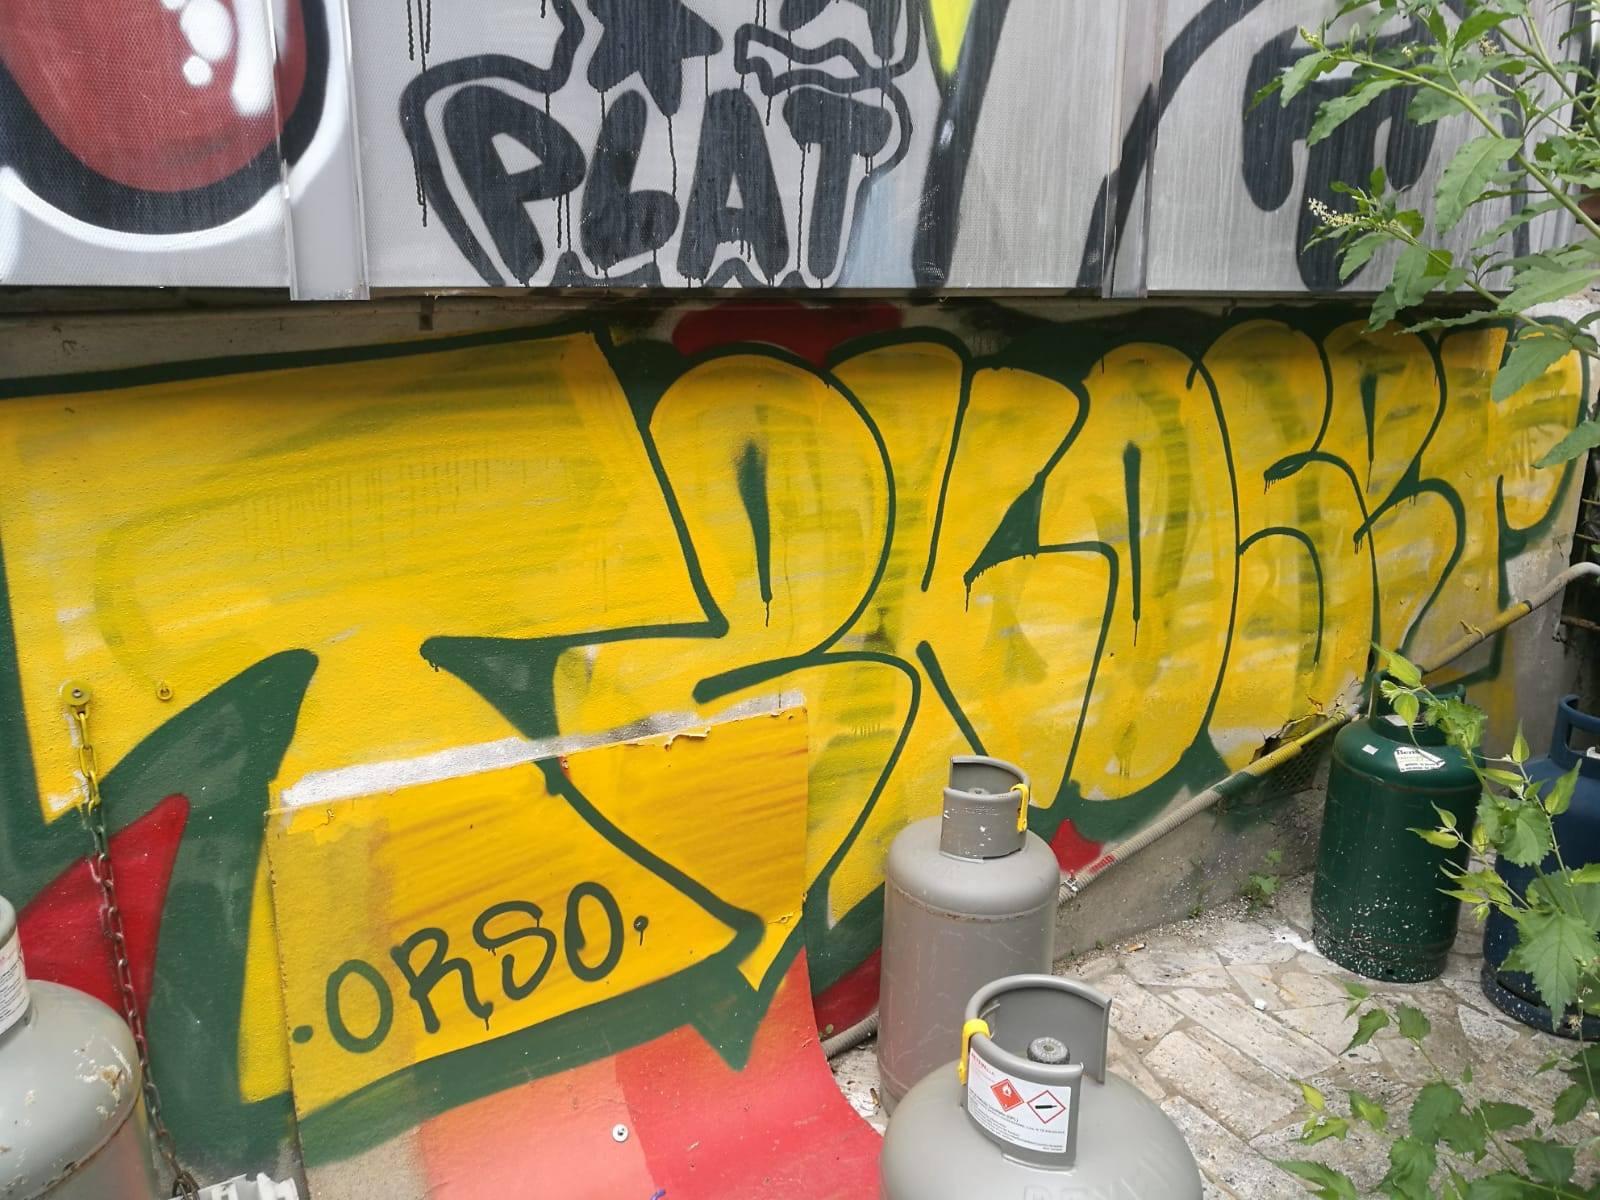 La poetica supereoistica italiana di Jeeg Robot banner